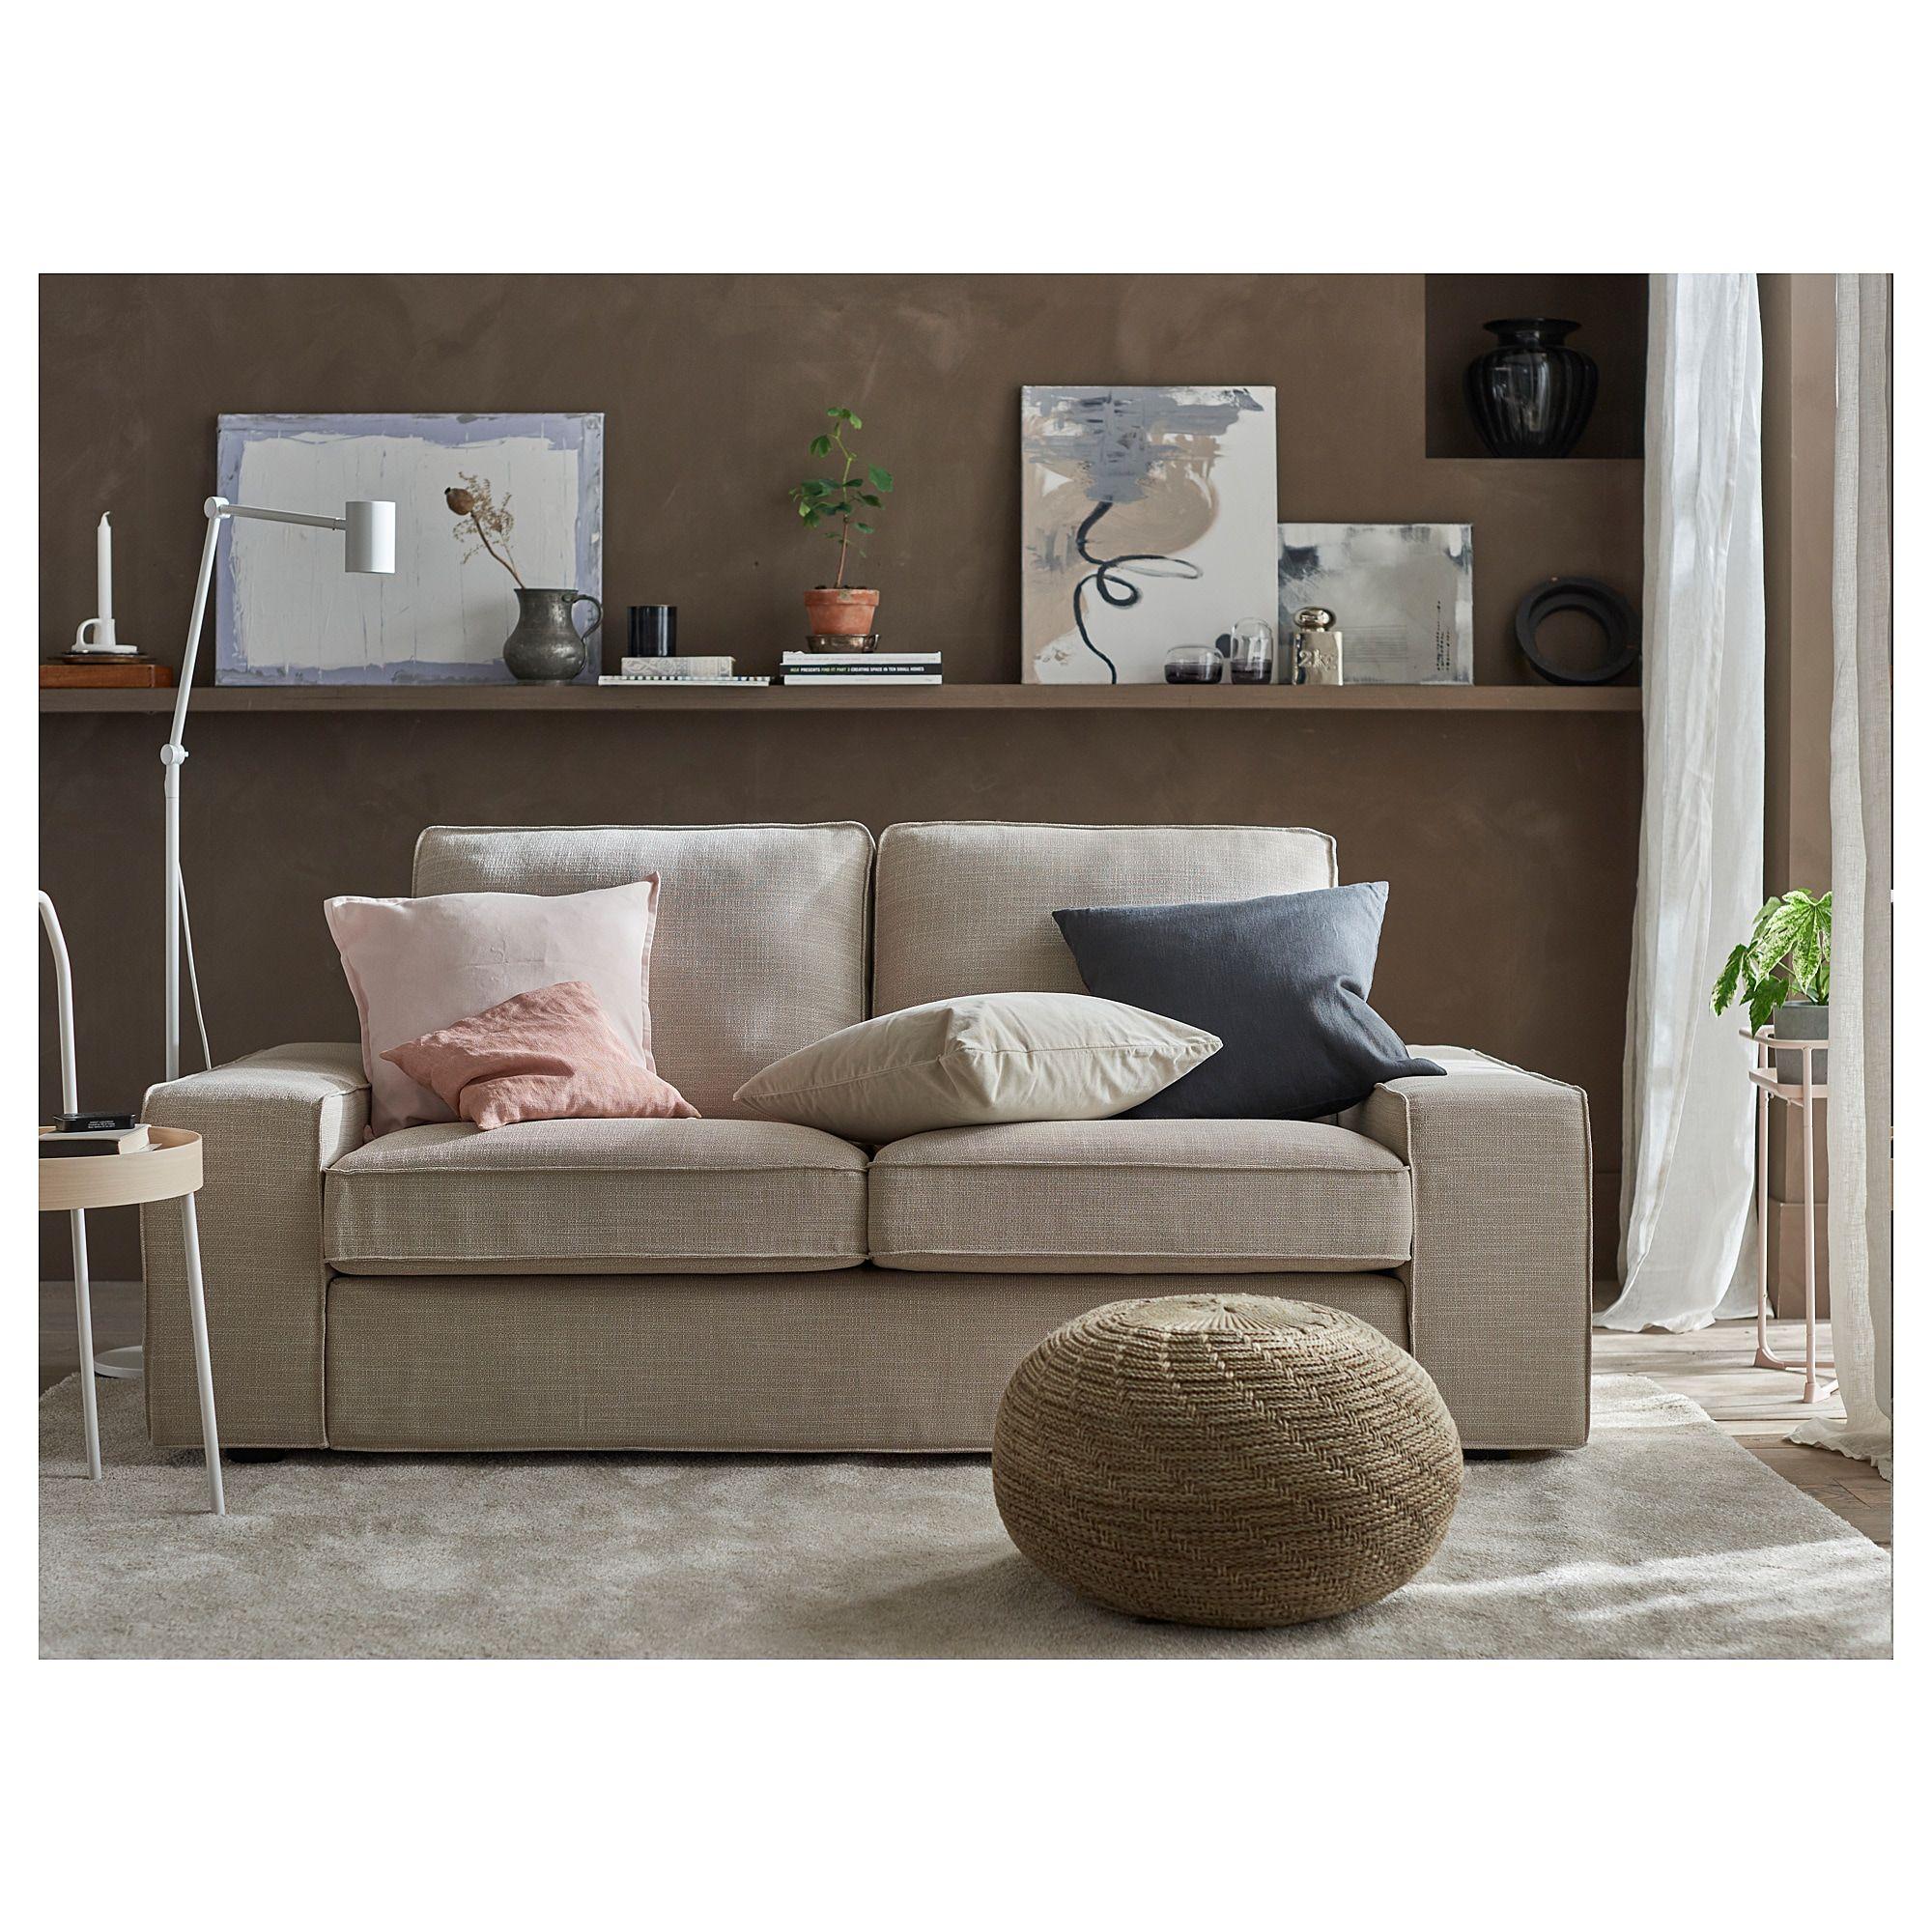 Kivik Loveseat Hillared Beige Ikea In 2020 Love Seat Loveseat Living Room Beige Room